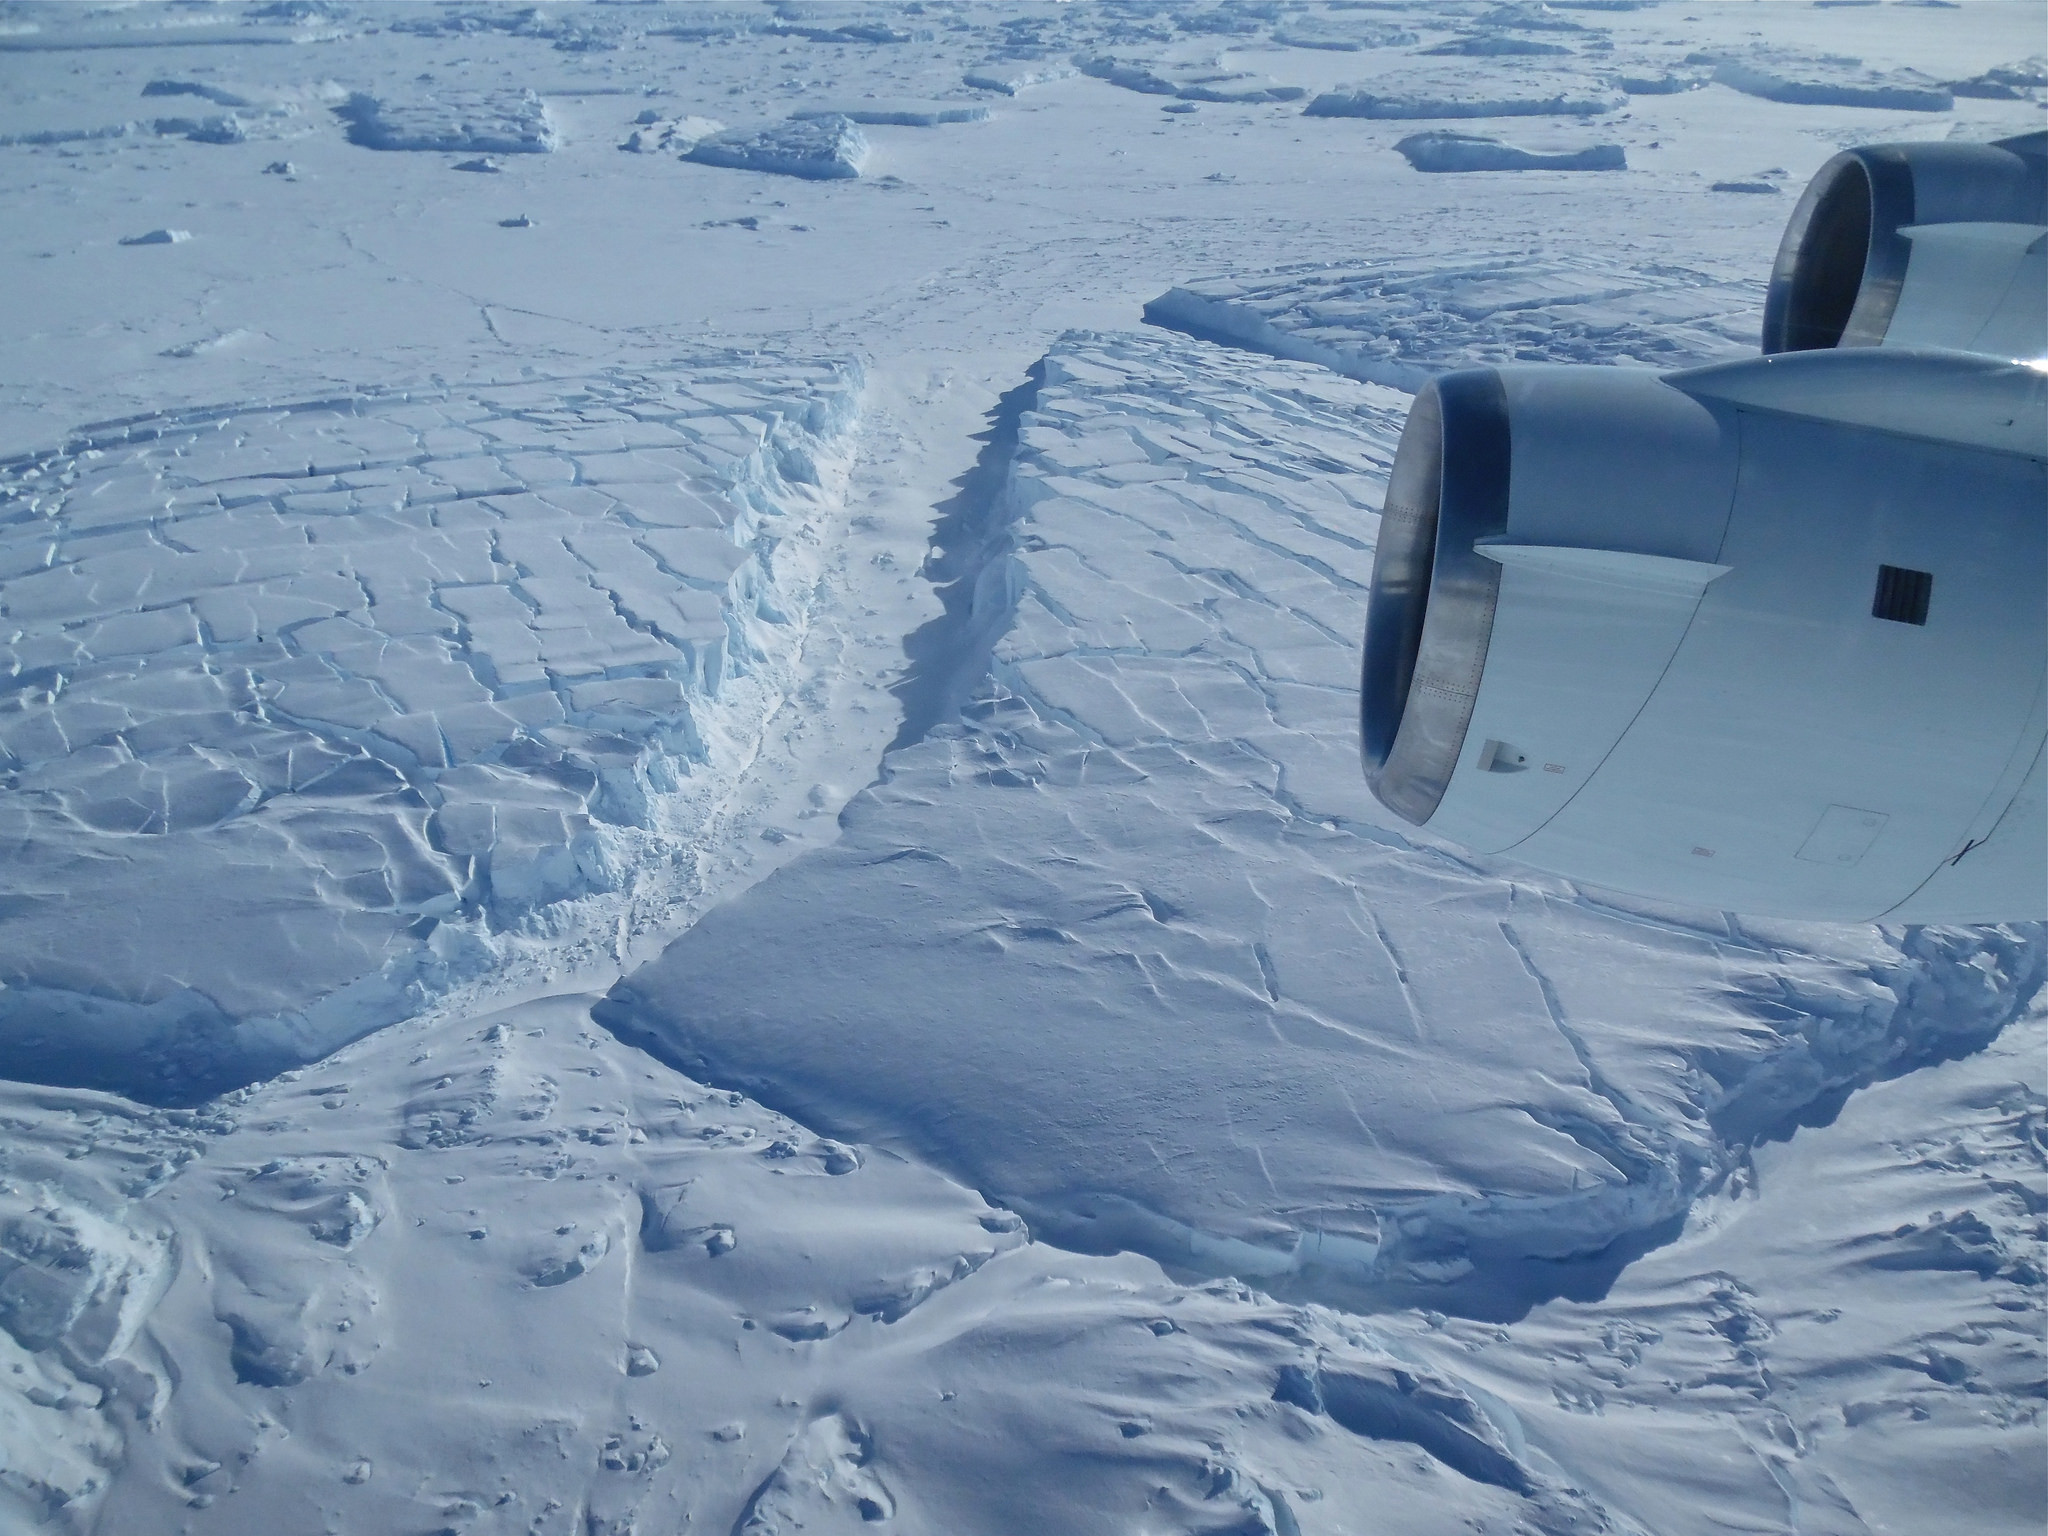 "<p>Фото &copy; Flickr/<a href=""https://www.flickr.com/photos/nasa_ice/"" title=""Go to NASA ICE's photostream"" data-track=""attributionNameClick"">NASA ICE</a></p>"